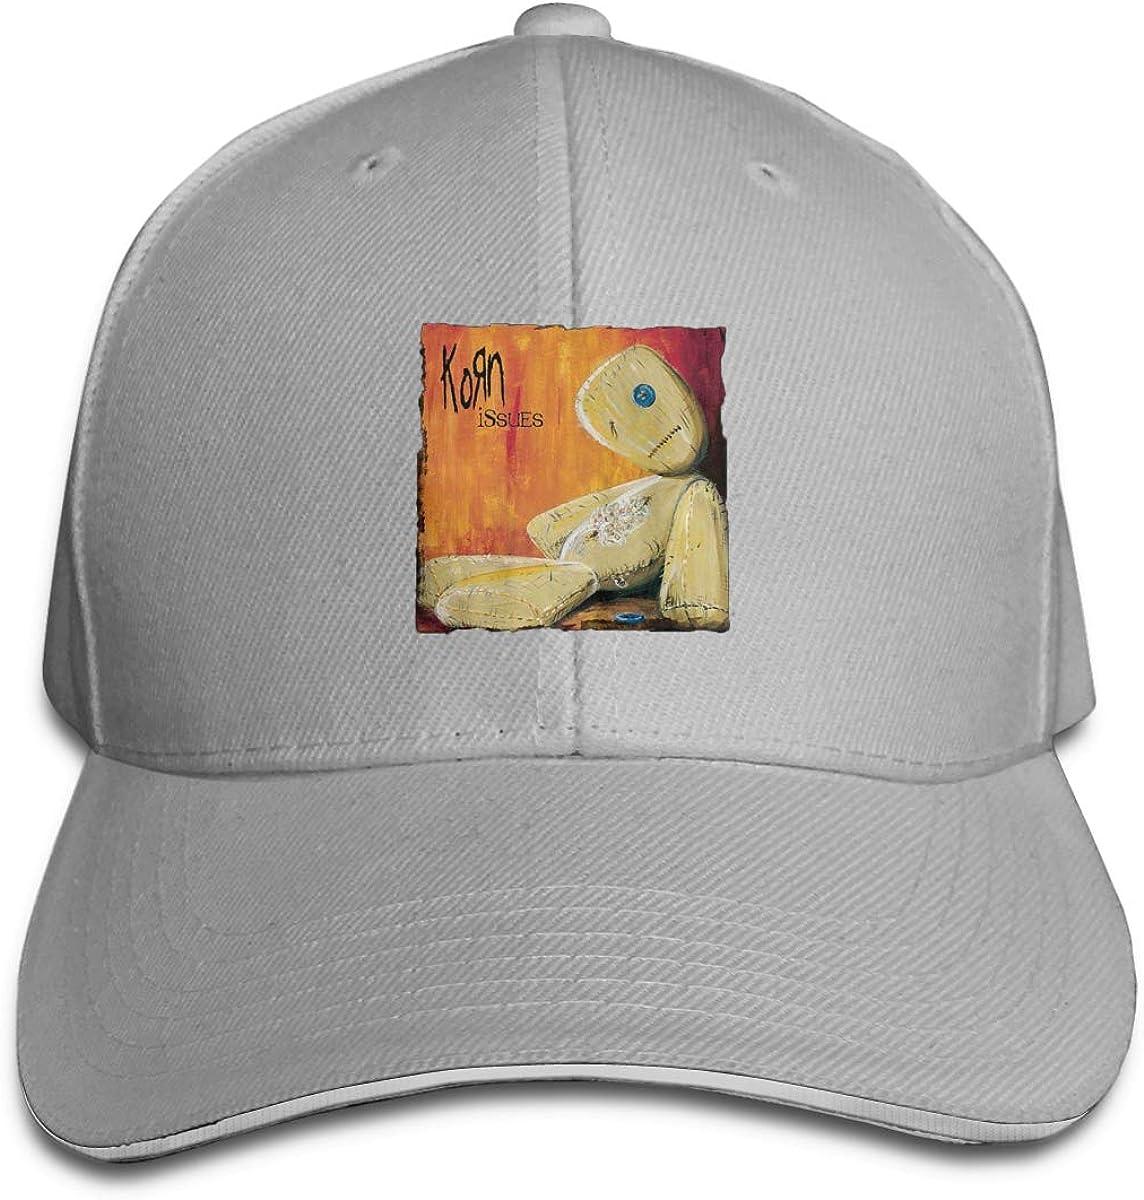 NCEUANCE Korn-Issues Caps Sports Trucker Caps Pattern Strapback Hat for Men//Women